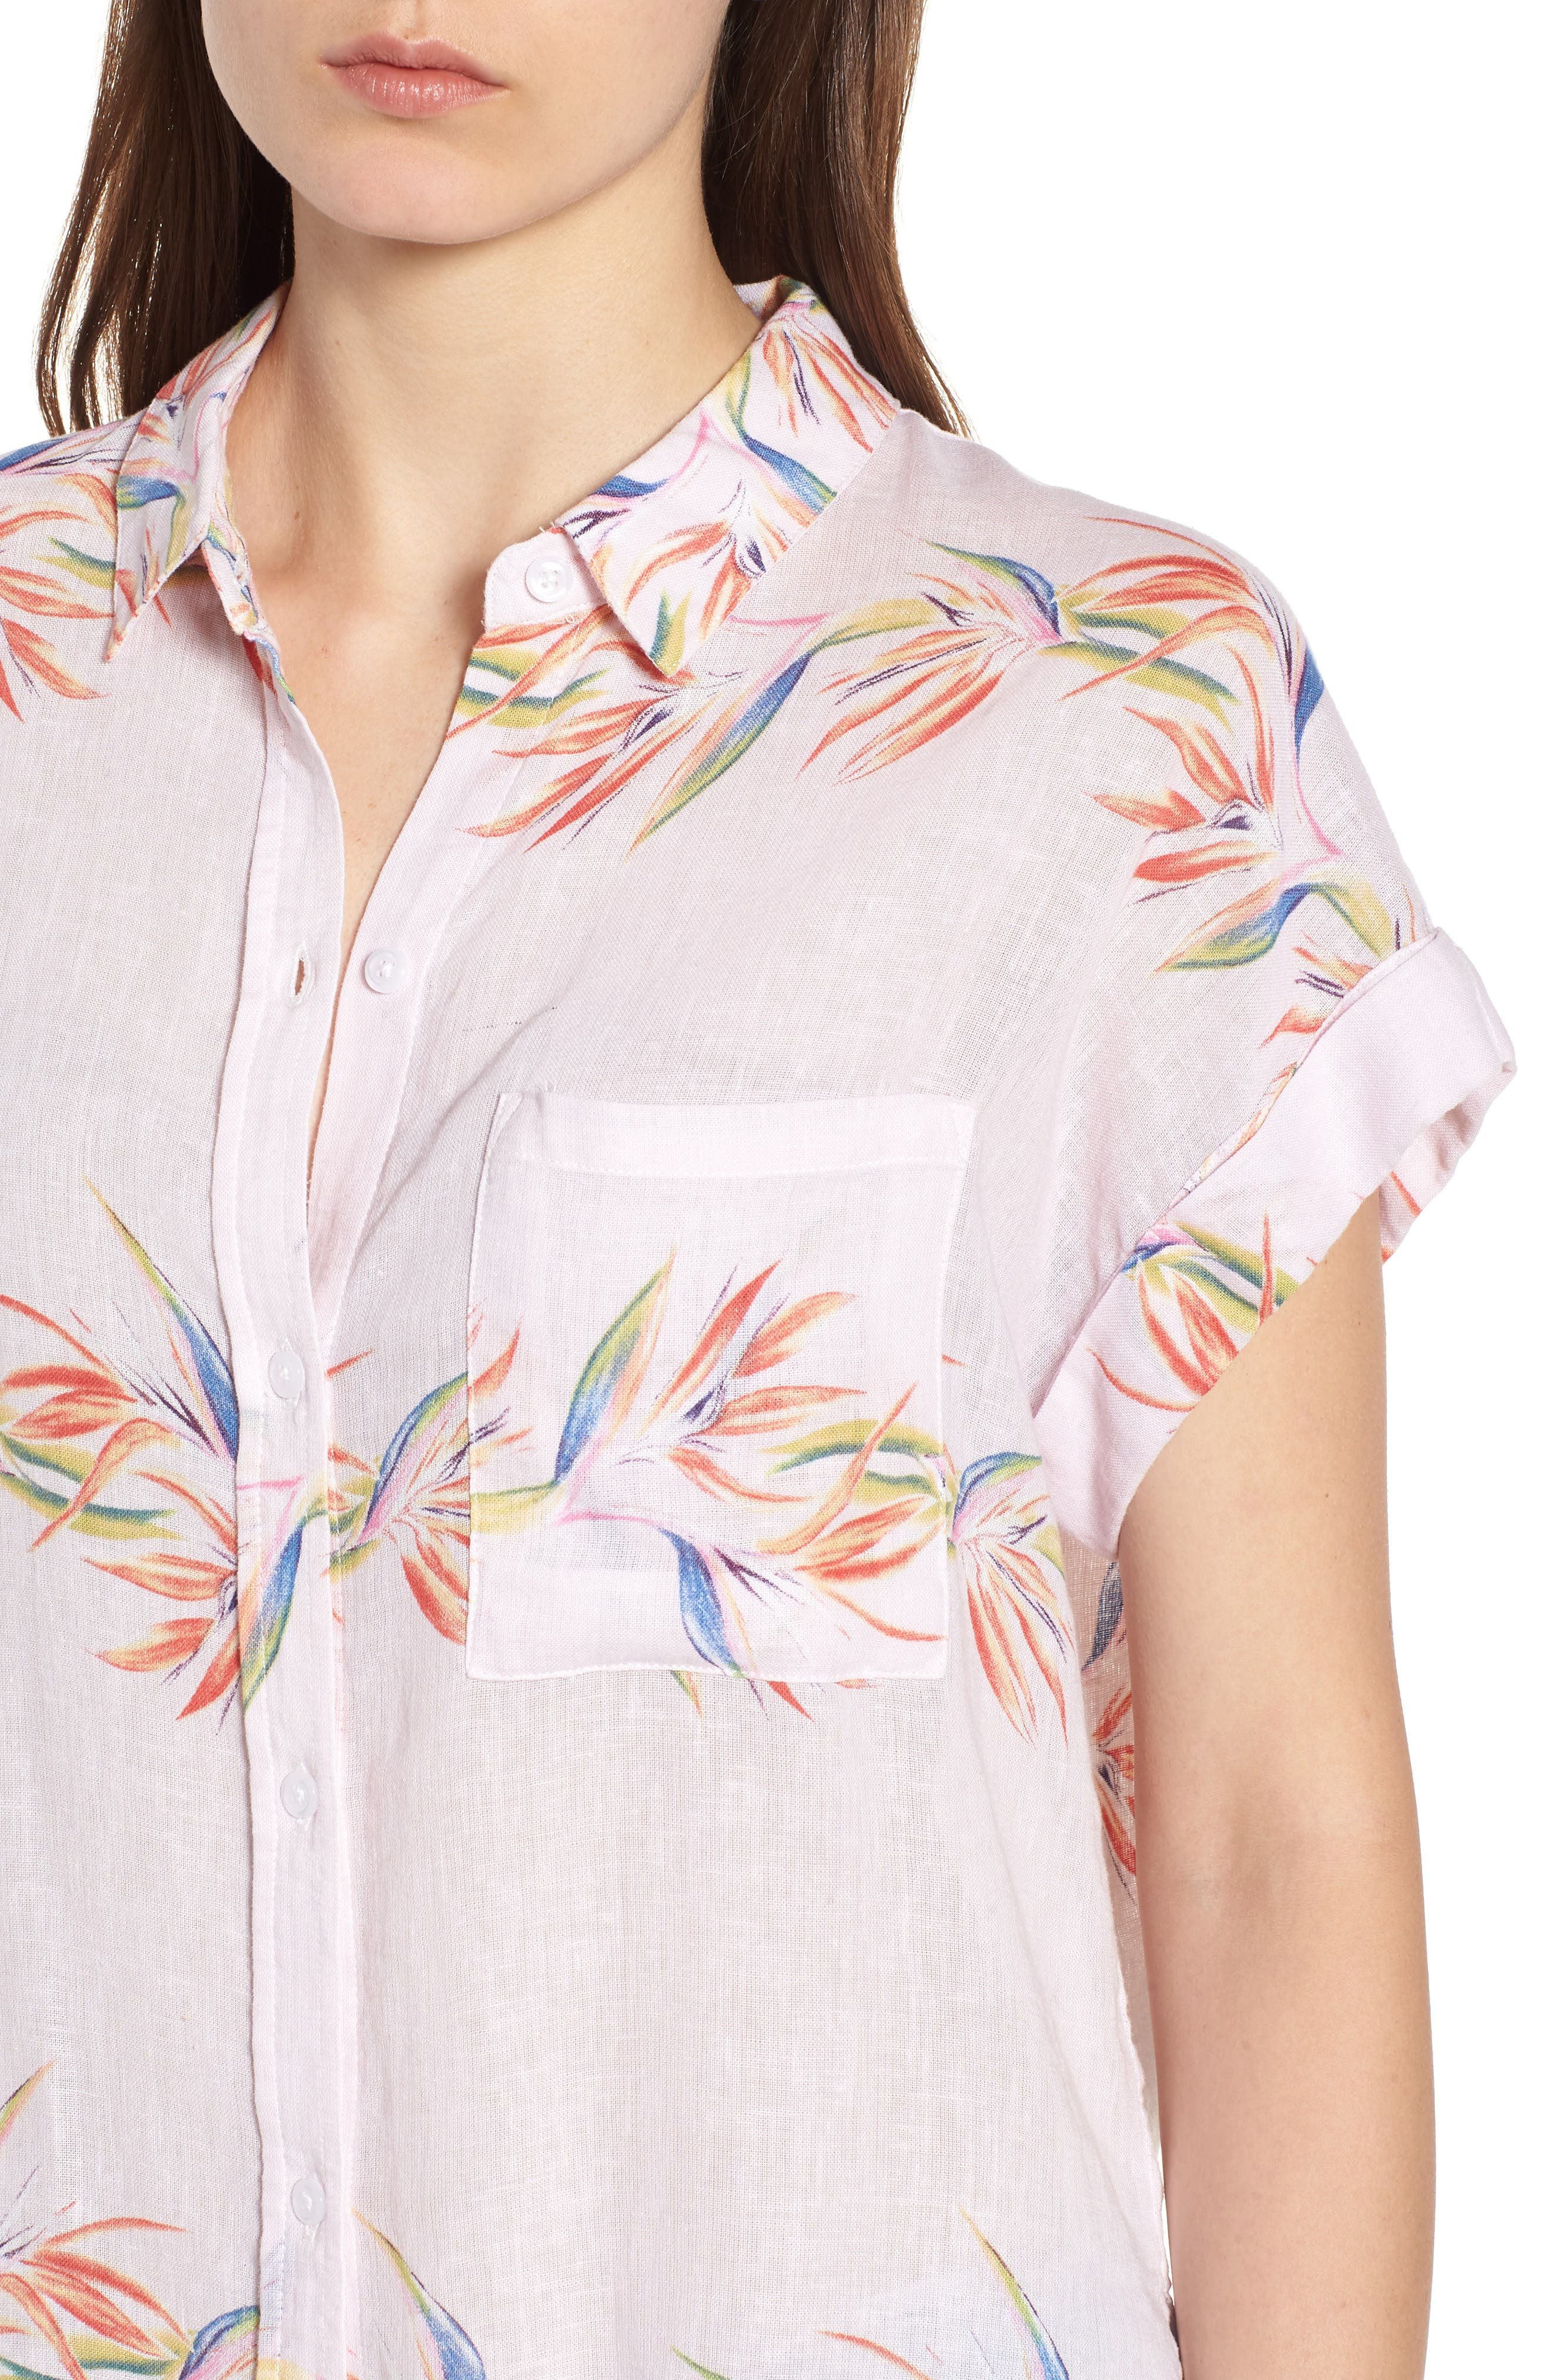 Whitney Print Shirt,                             Alternate thumbnail 4, color,                             BLUSH BIRDS OF PARADISE